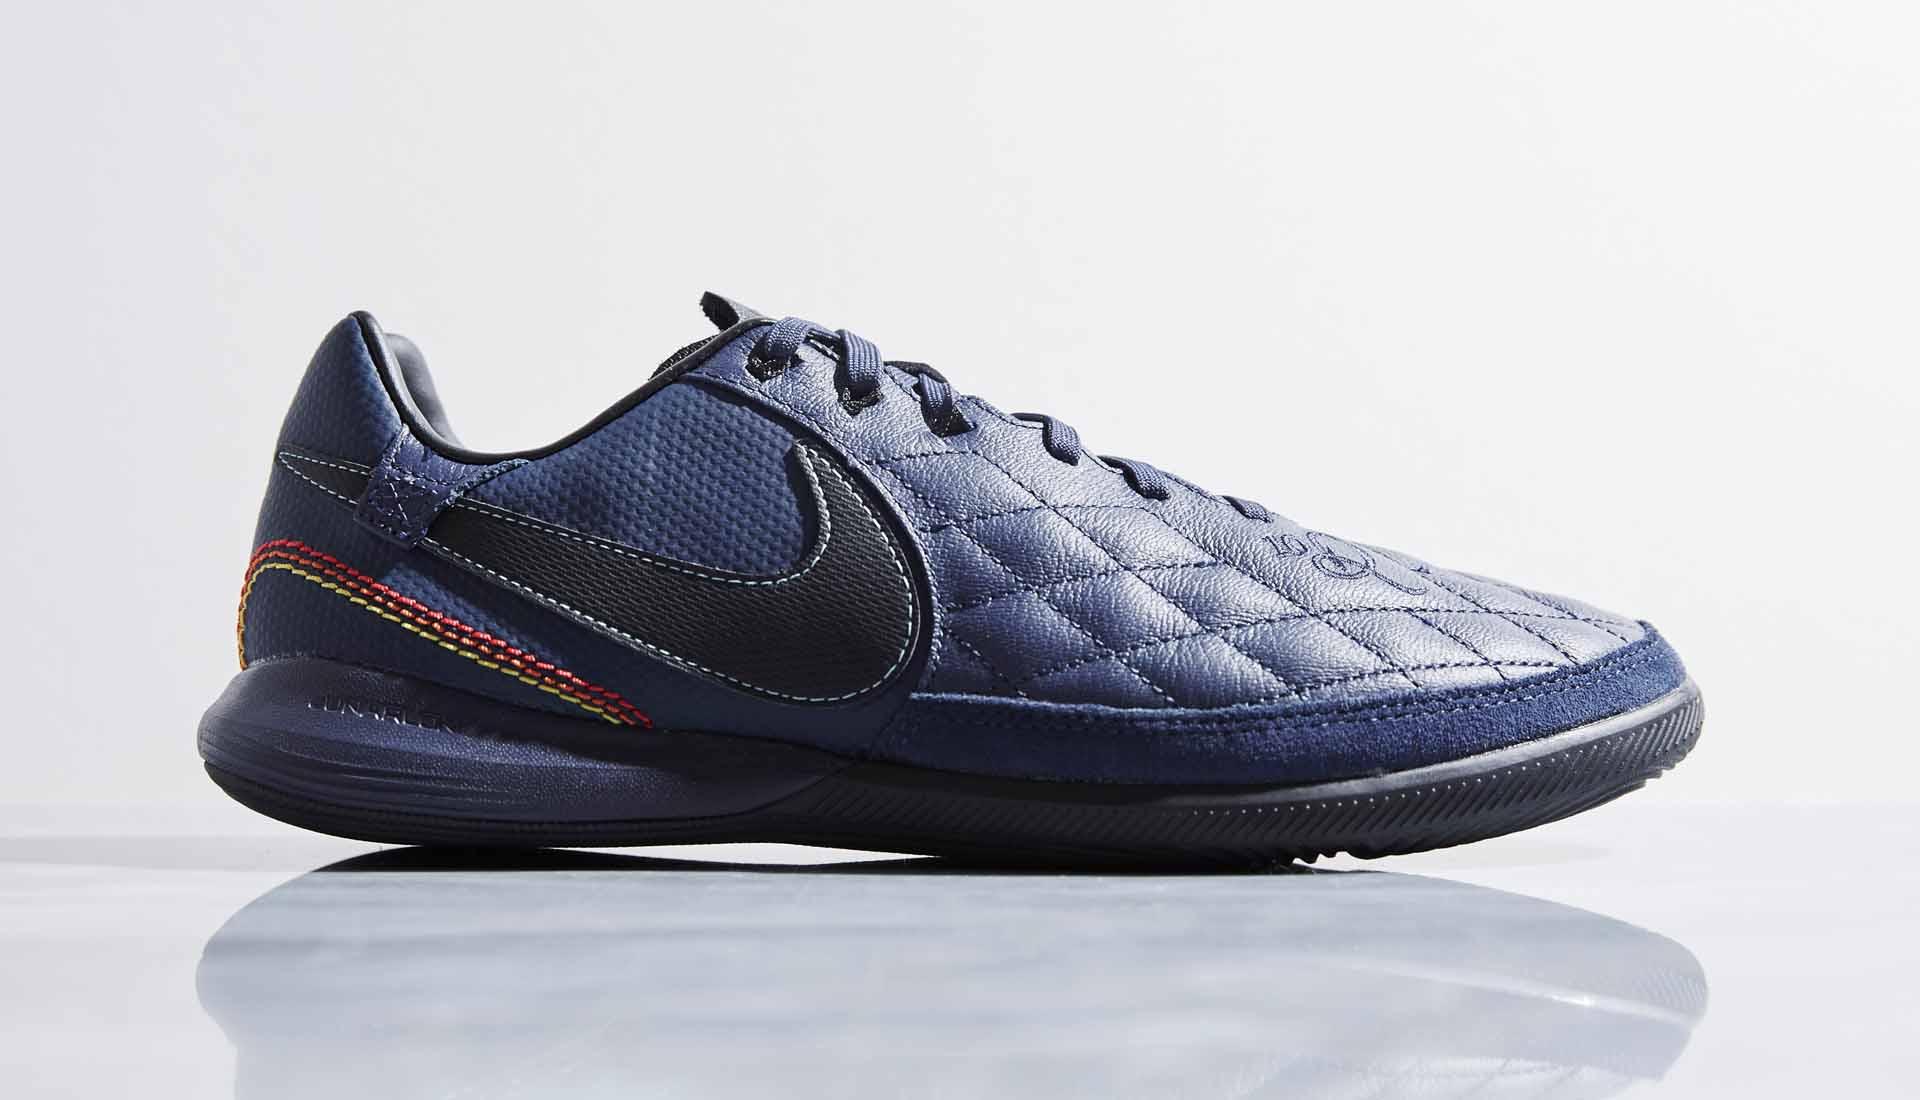 Nike Launch The TiempoX Finale Ronaldinho10 - SoccerBible 6ac5eea453976